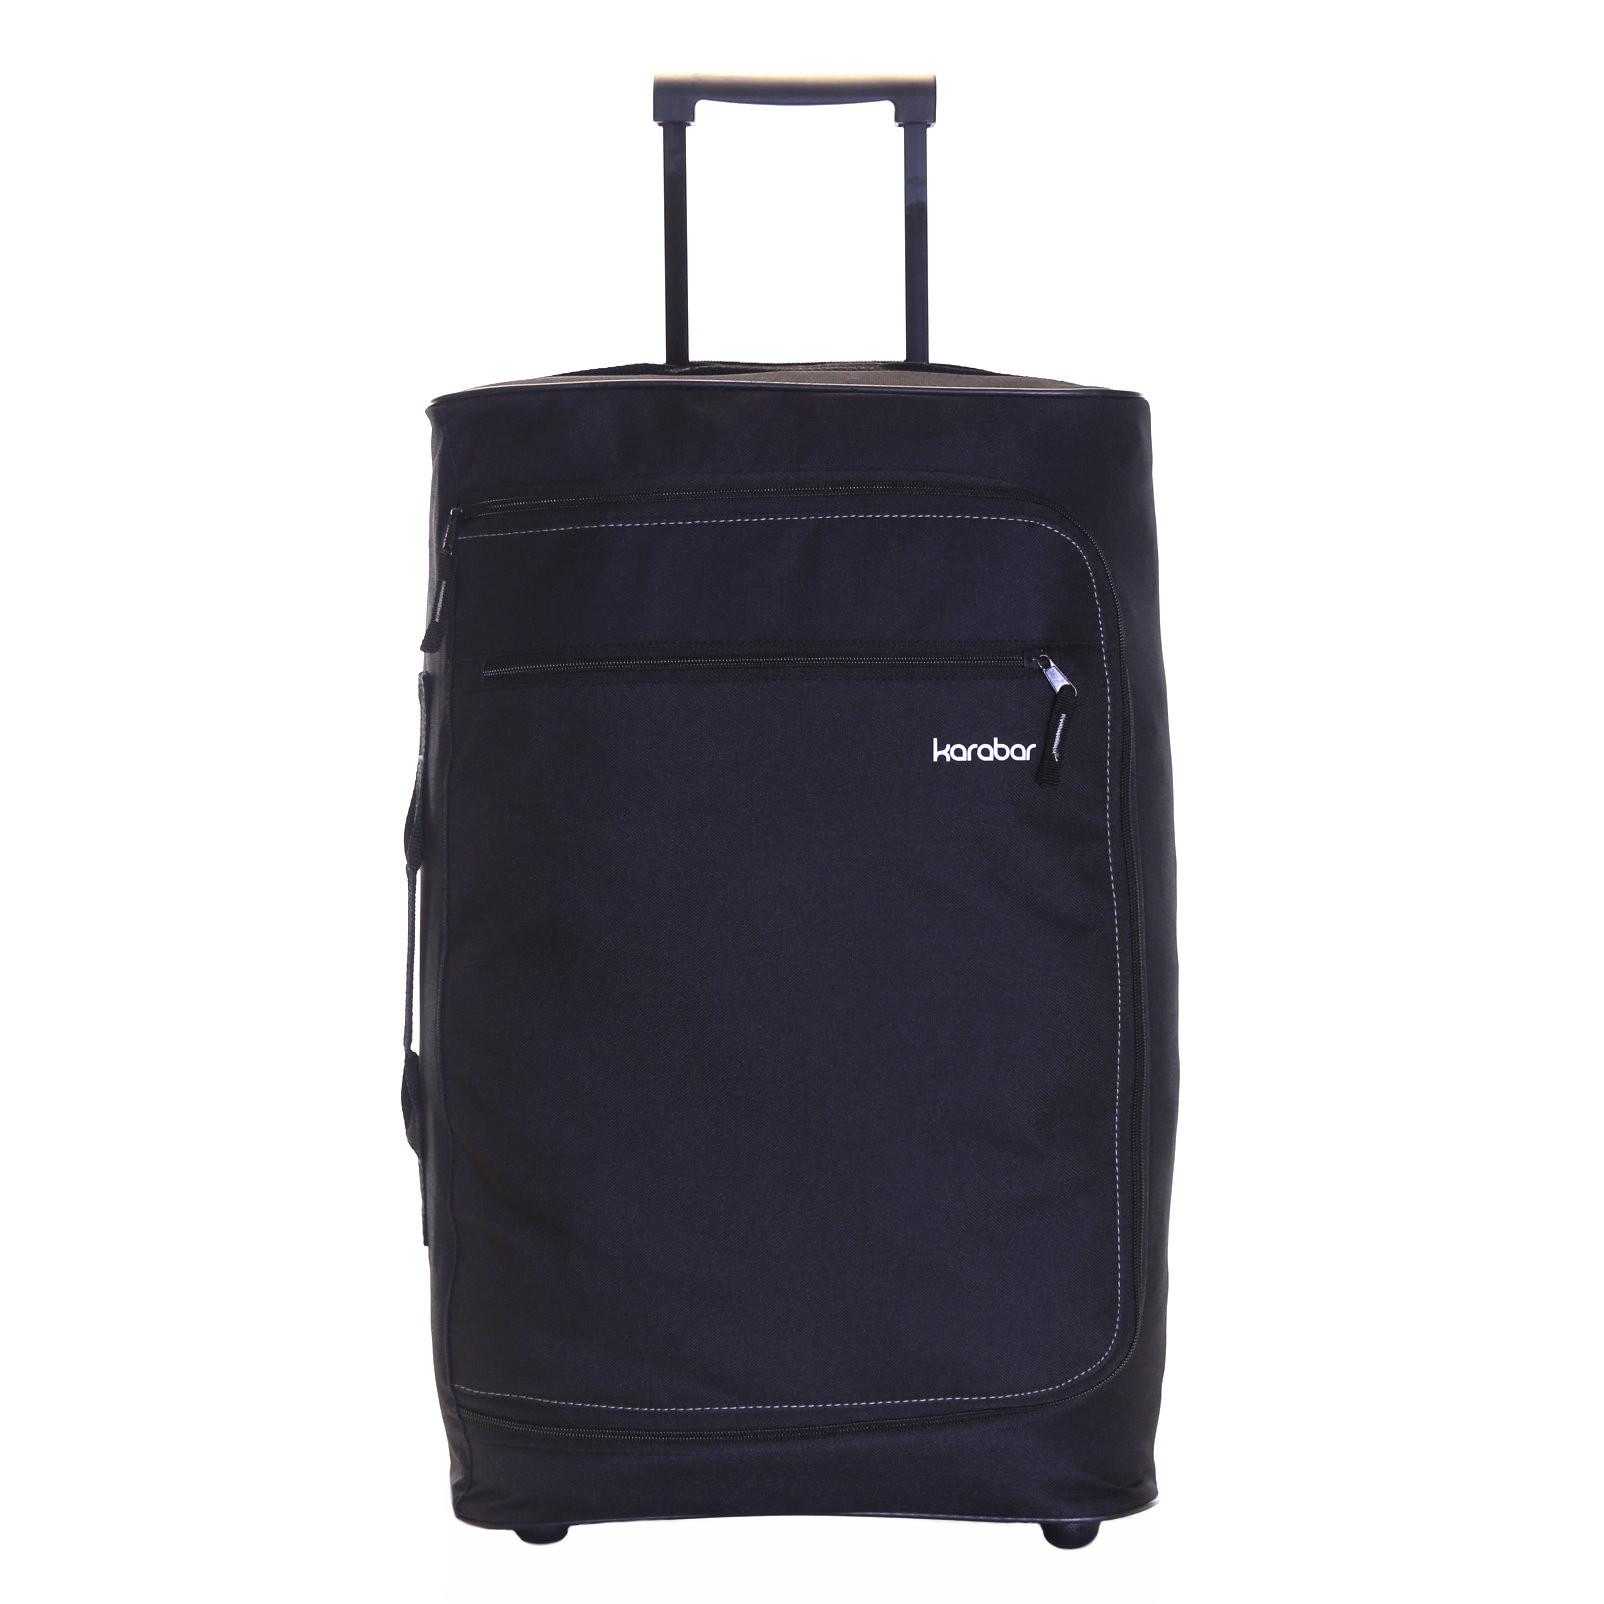 Holt Cabin Approved Luggage Backpack